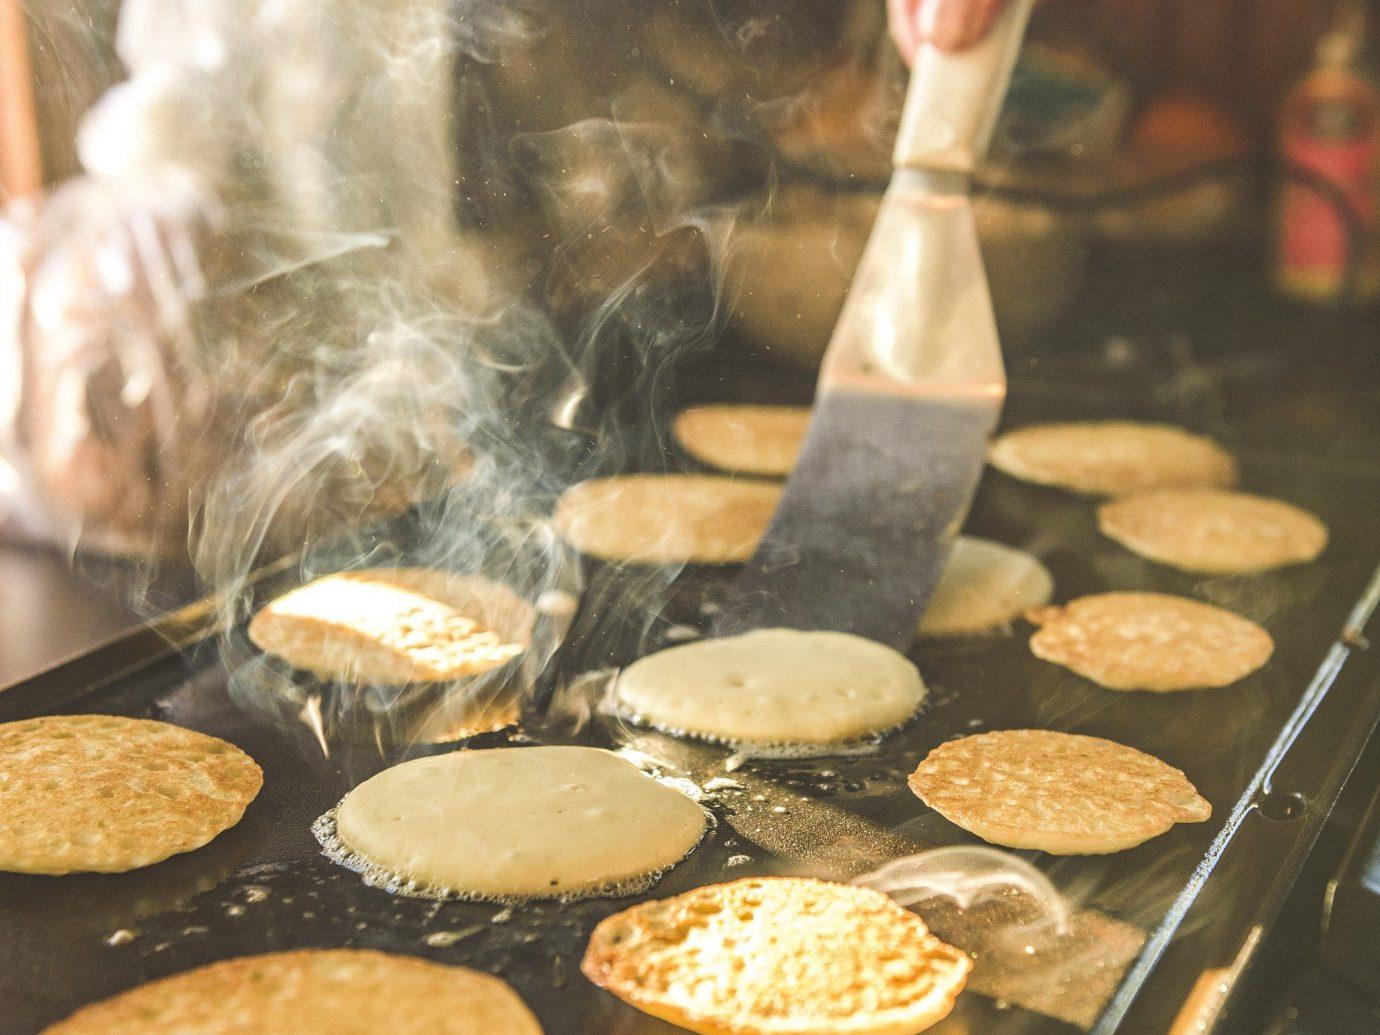 Health + Wellness Meditation Retreats Trip Ideas Yoga Retreats person human action dish indoor food meal cooking kitchenware baking breakfast sense cuisine grill griddle